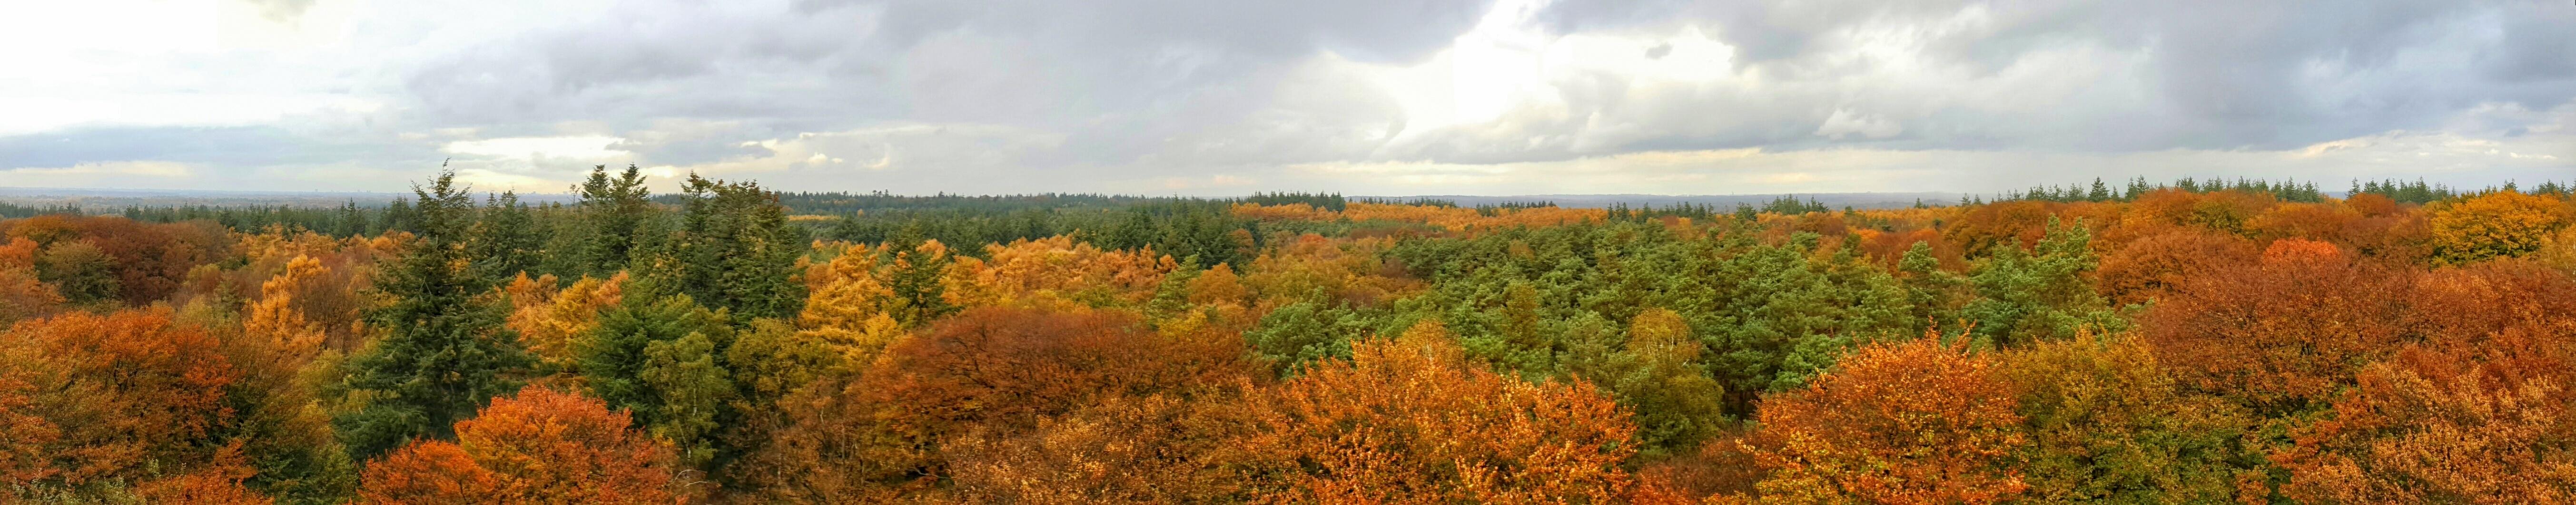 mooie plekken utrechtse heuvelrug - uitkijktoren kaapse bossen